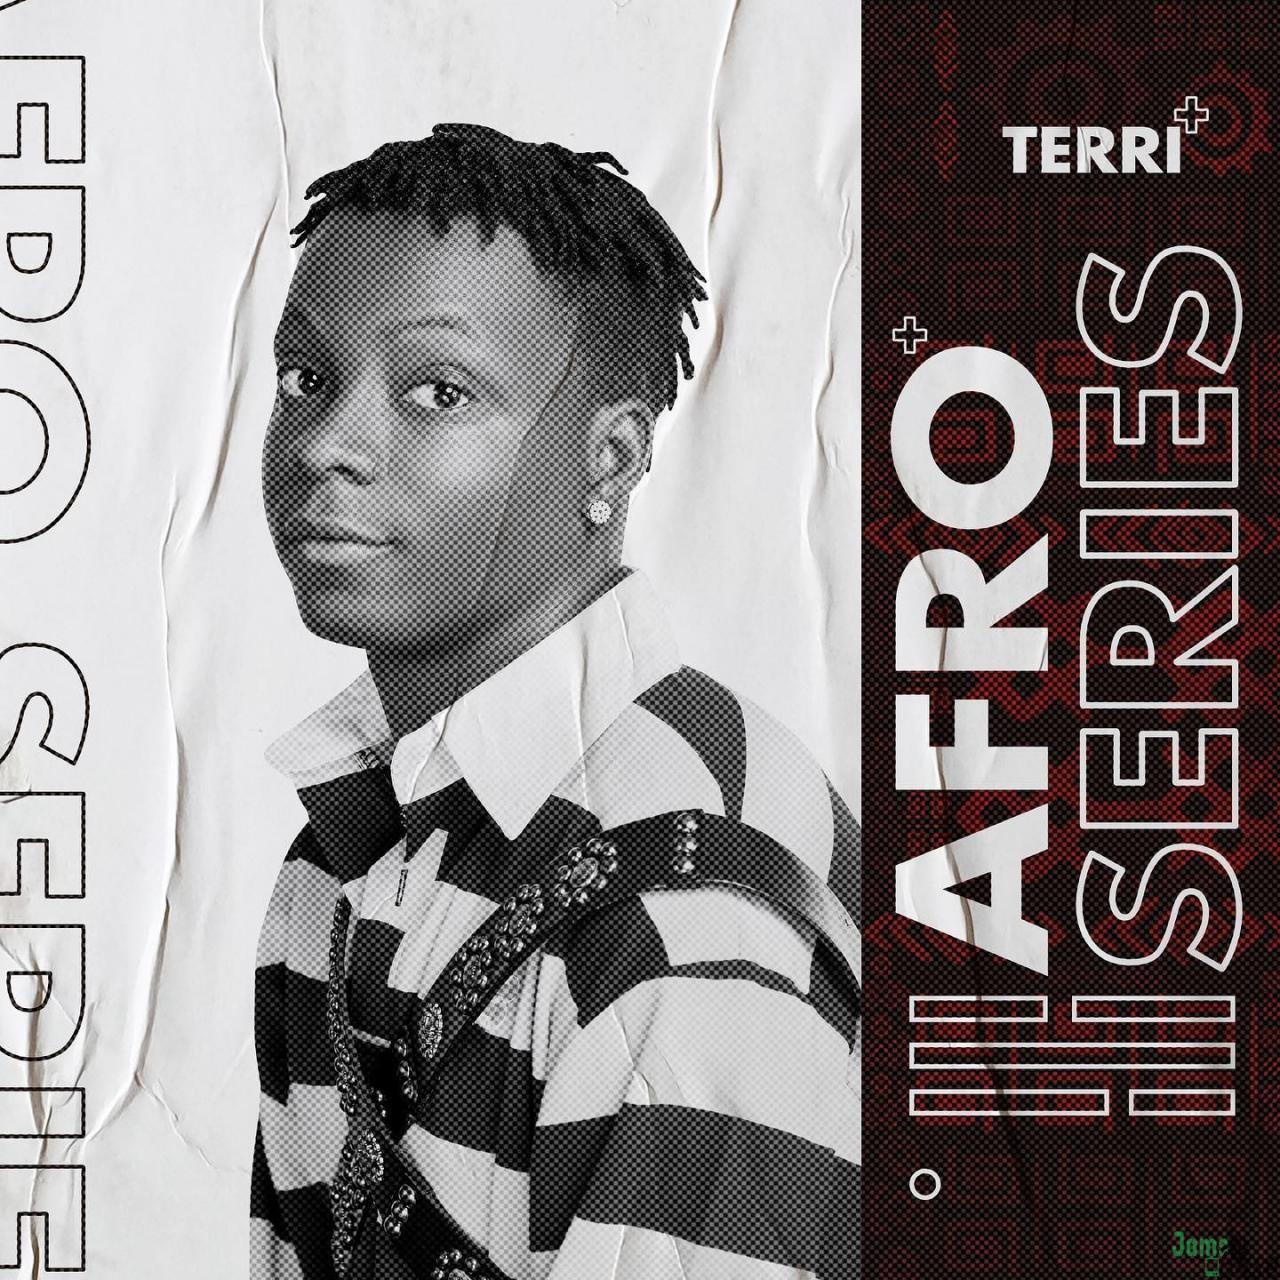 Download Terri – My Chest